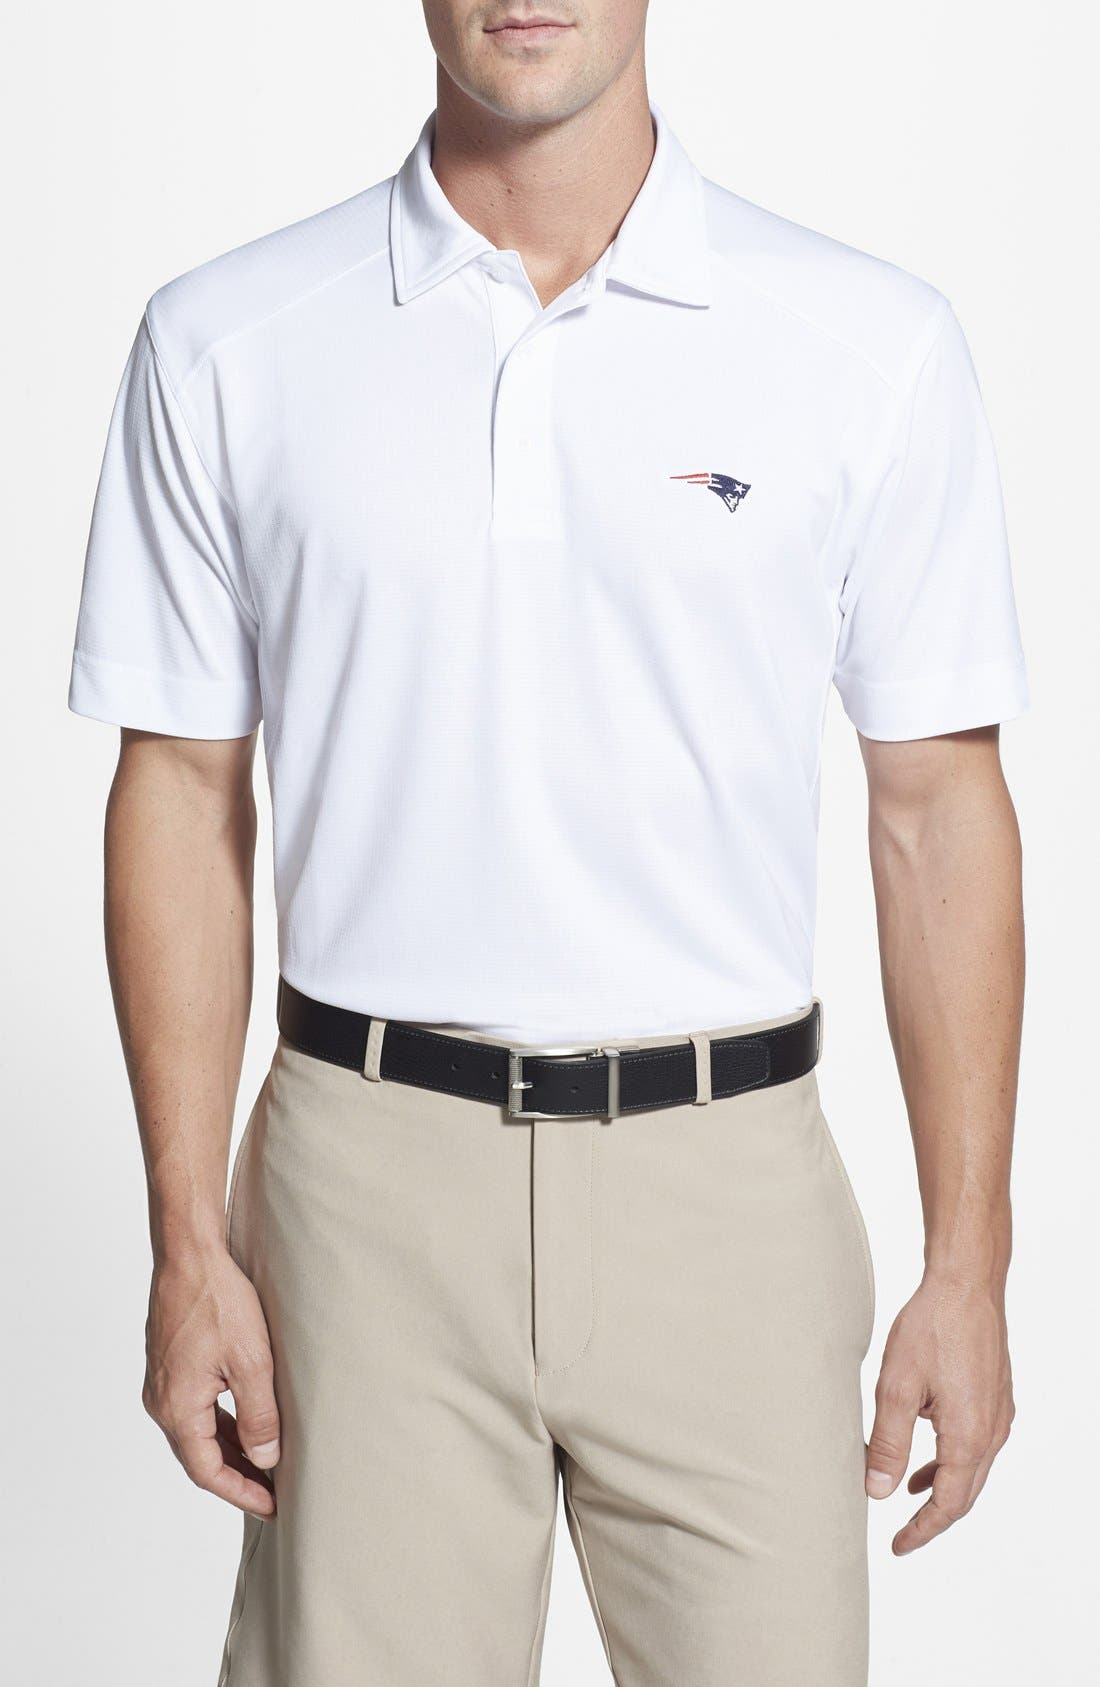 'New England Patriots - Genre' DryTec Moisture Wicking Polo,                             Main thumbnail 1, color,                             White